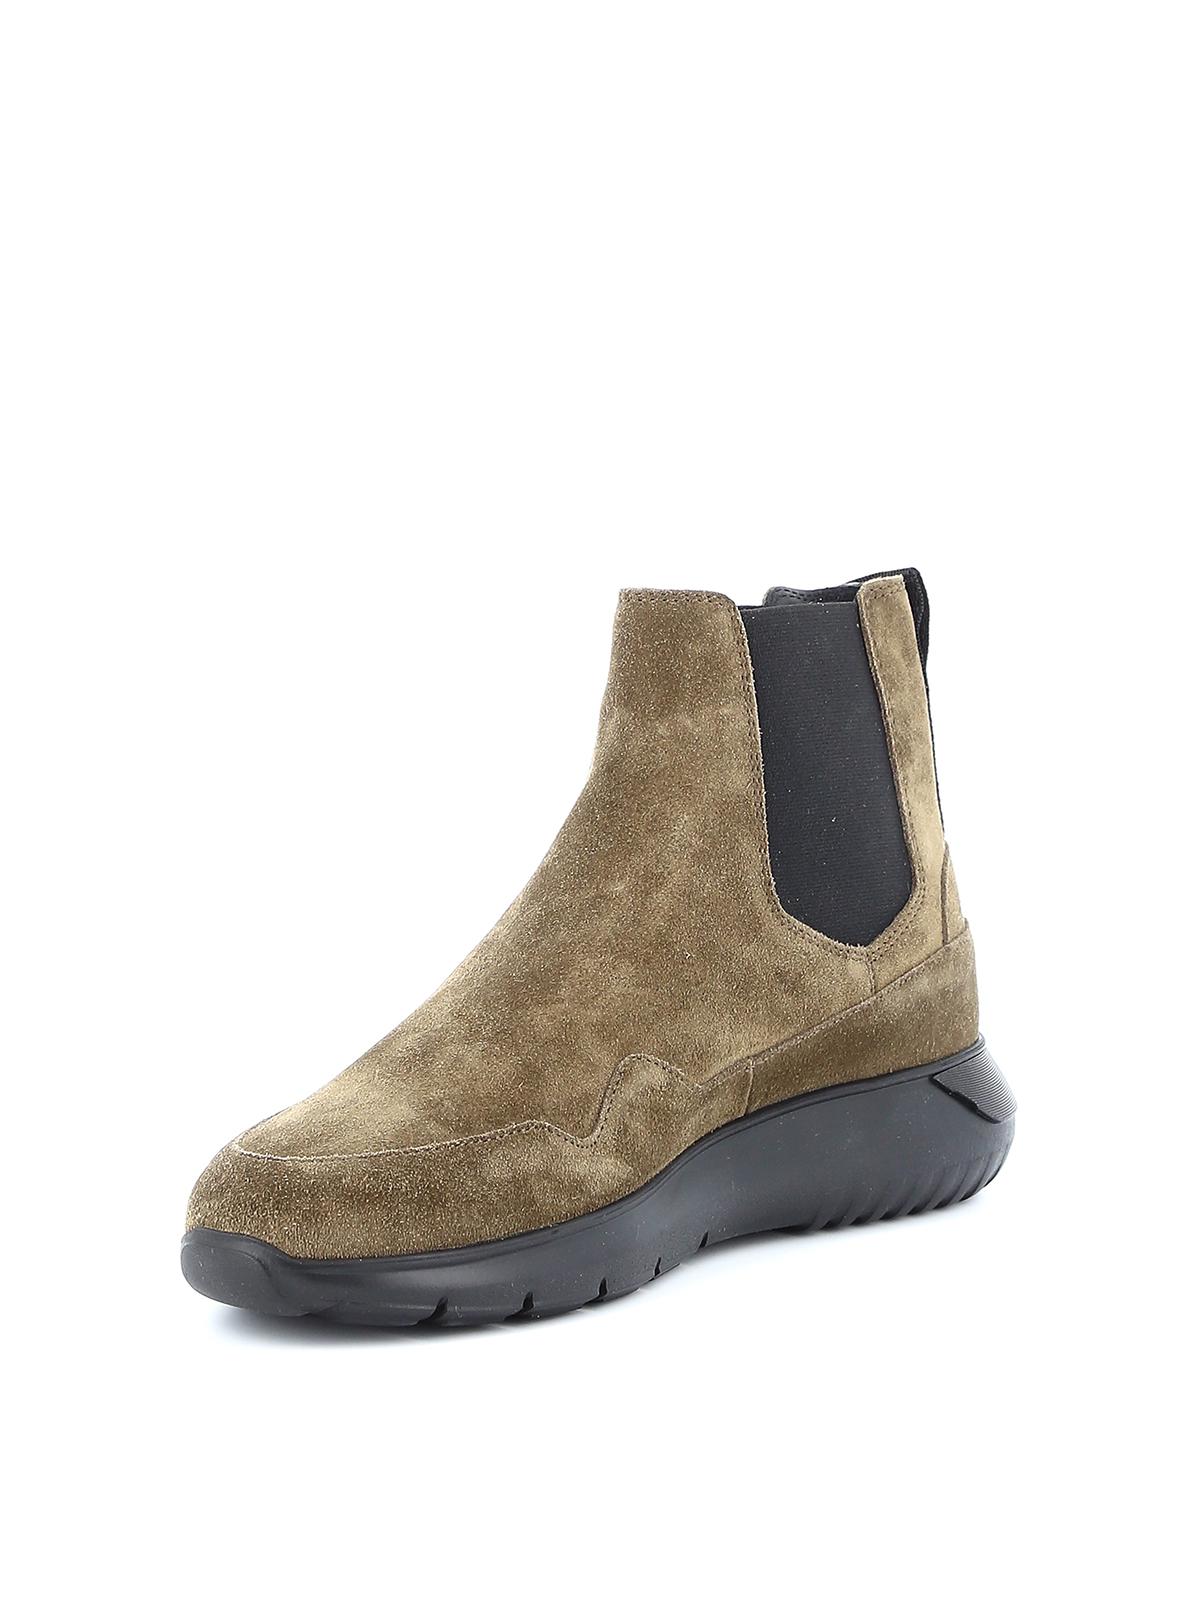 Ankle boots Hogan - Interactive³ Chelsea boots - HXM3710CG30LDUS413